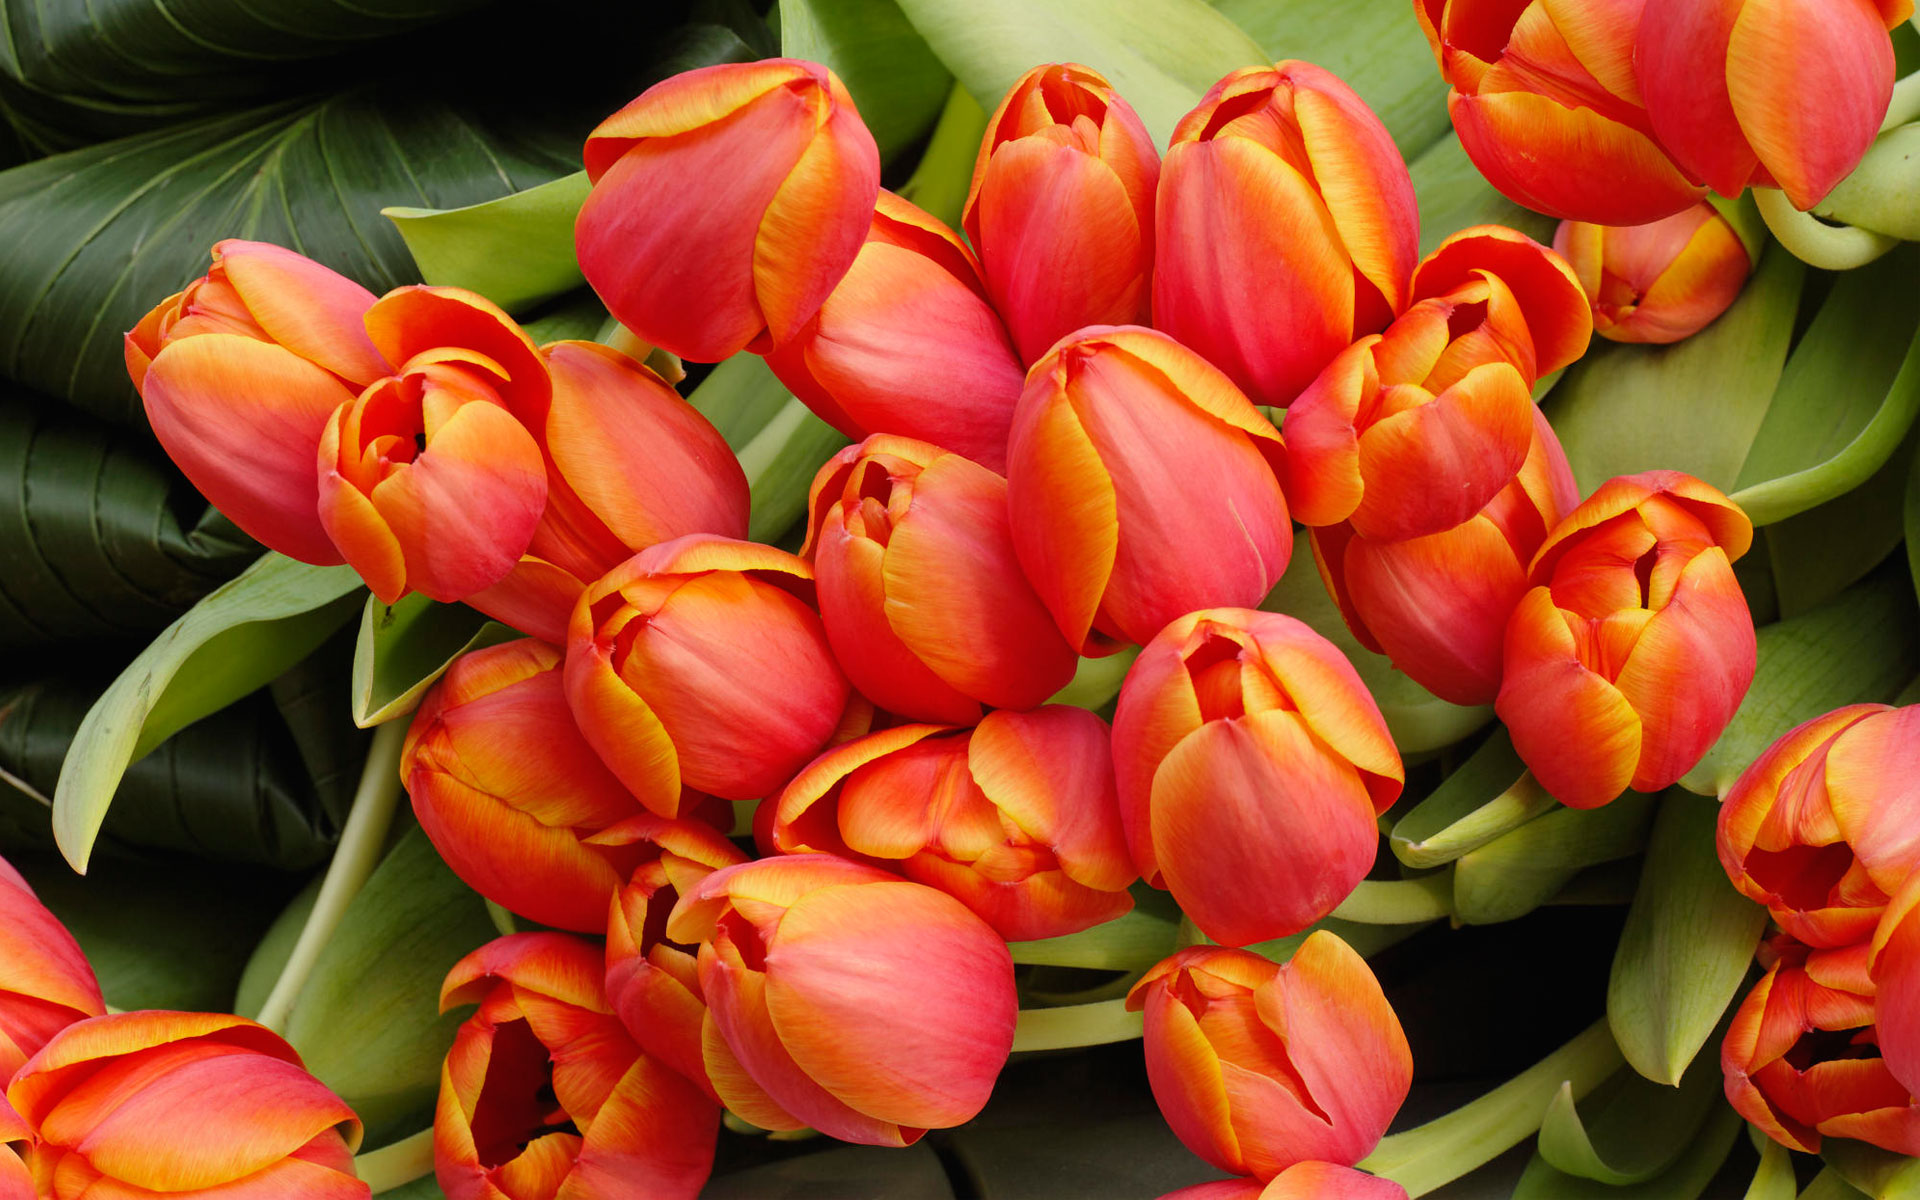 wallpaper tulips flowers  wallpapersafari, Beautiful flower